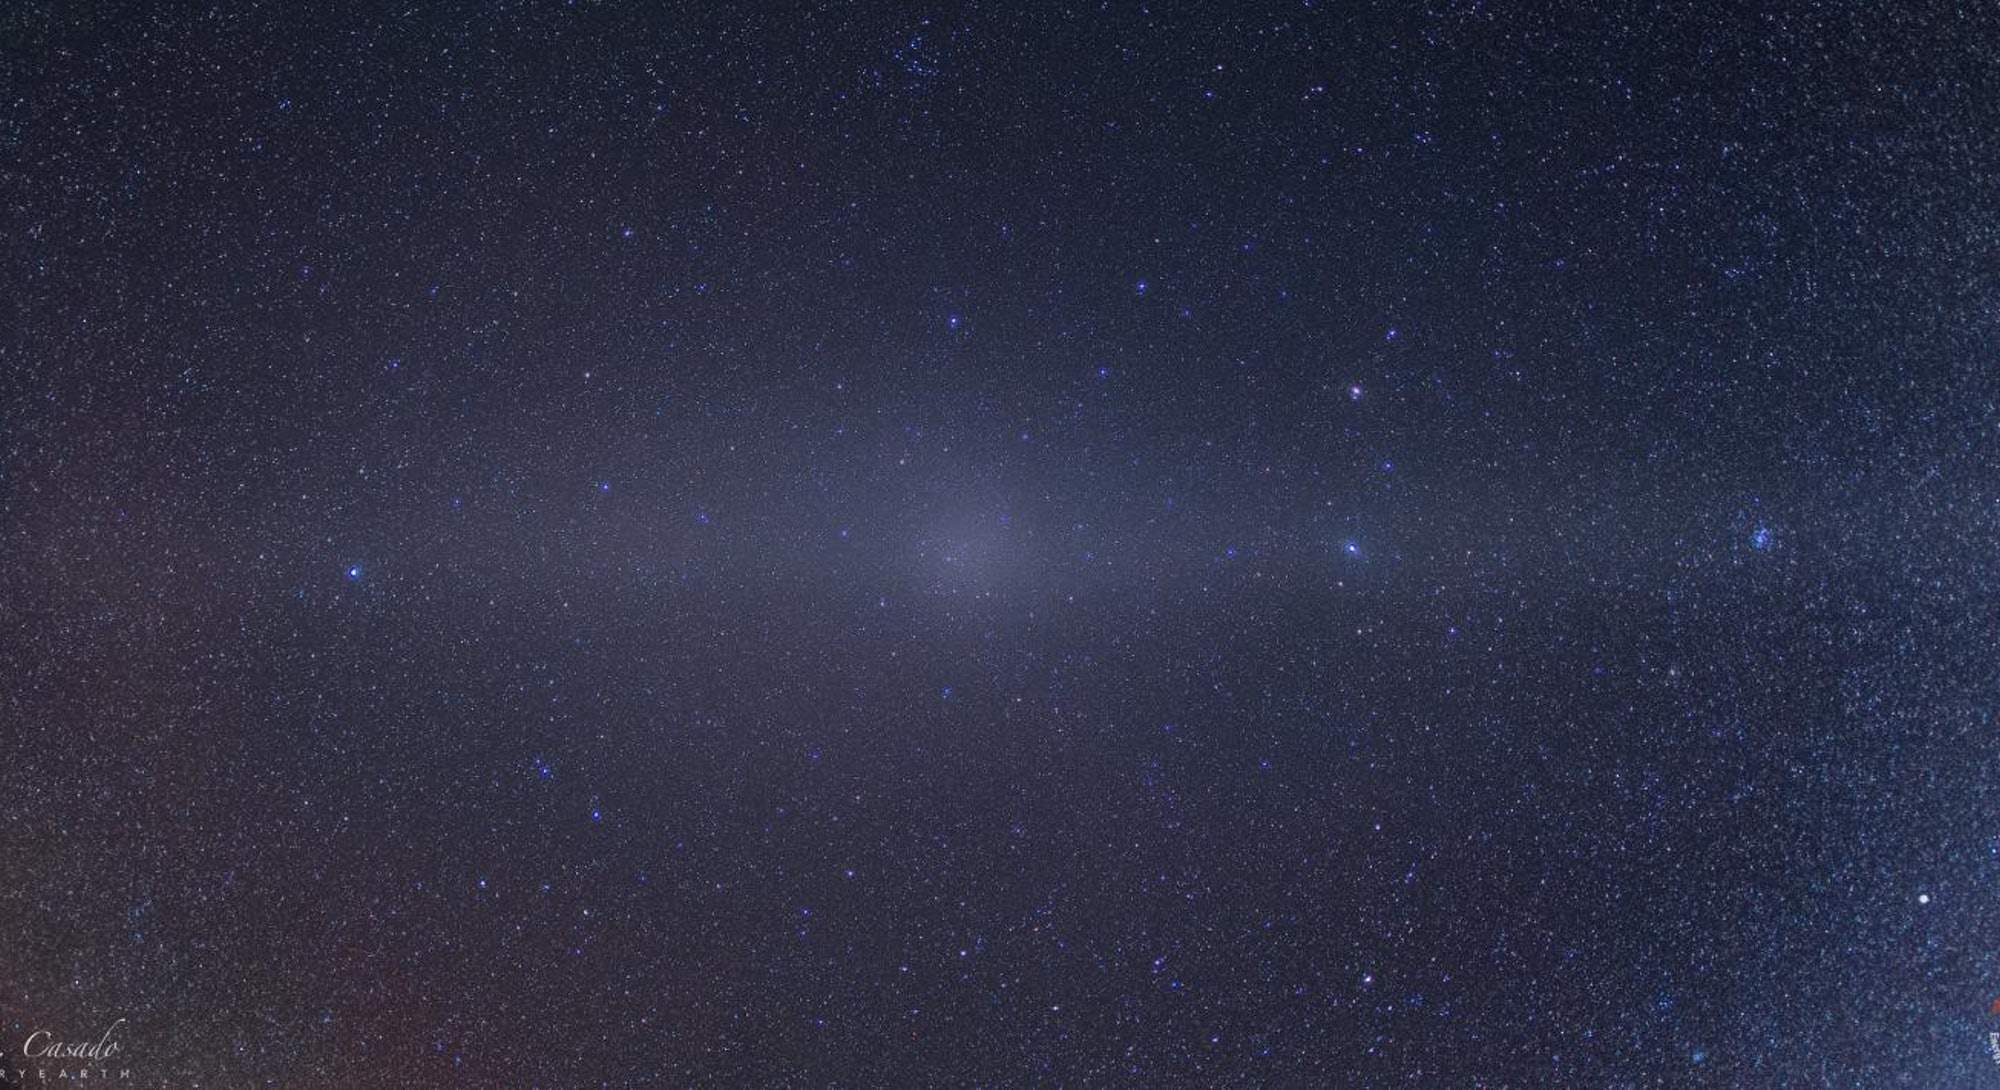 image of the night sky